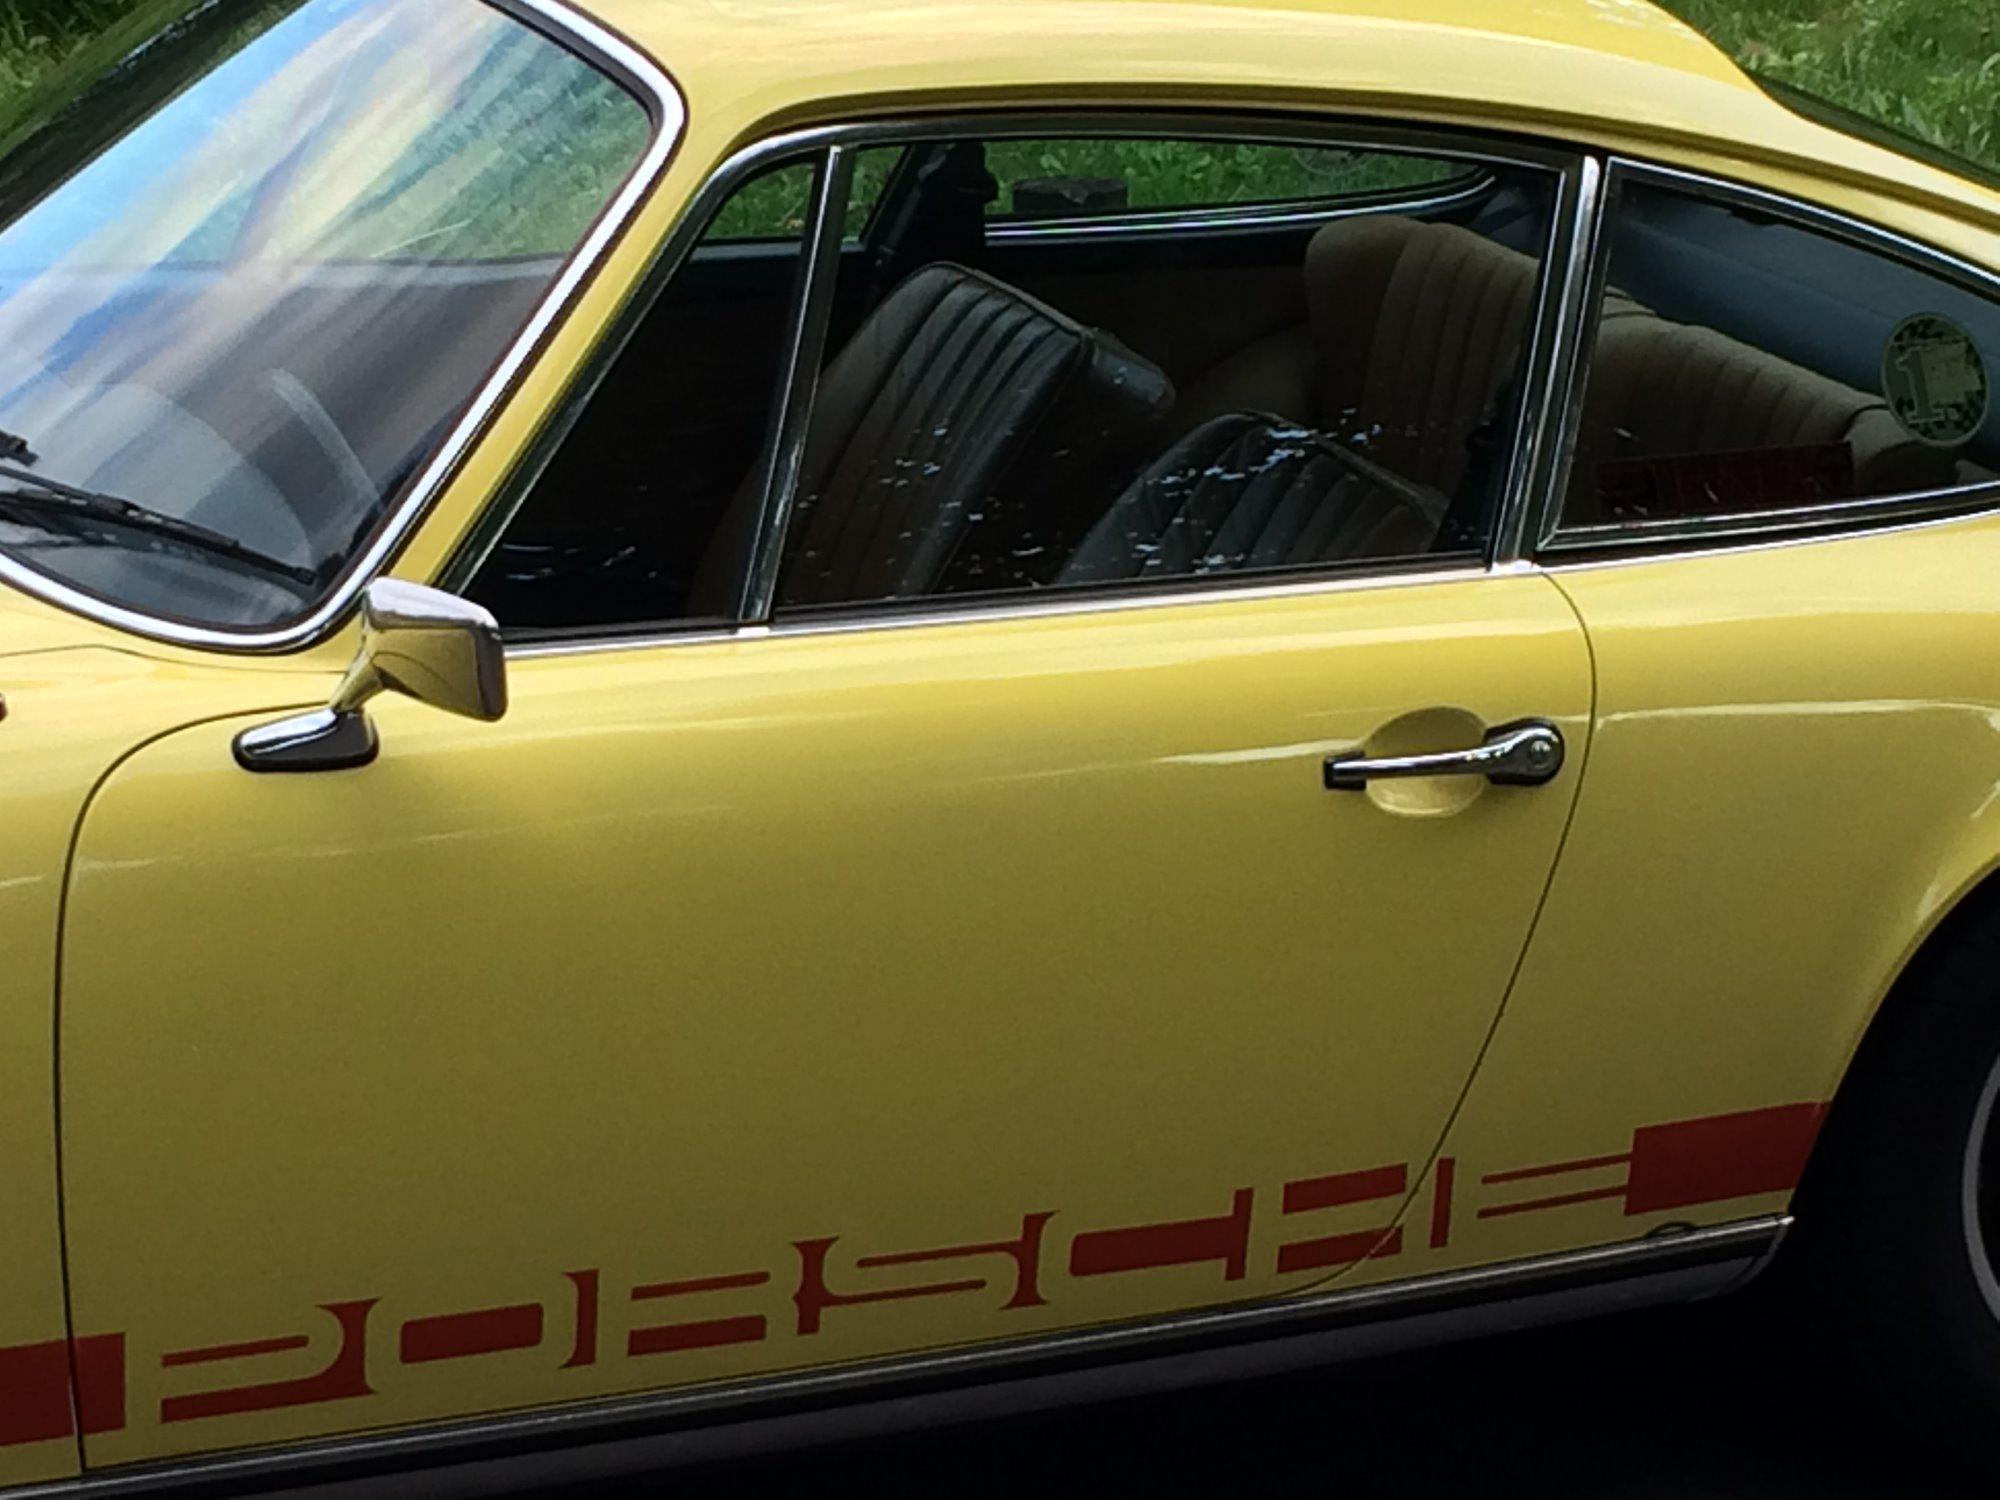 Porsche9112.4TE197305360.JPG